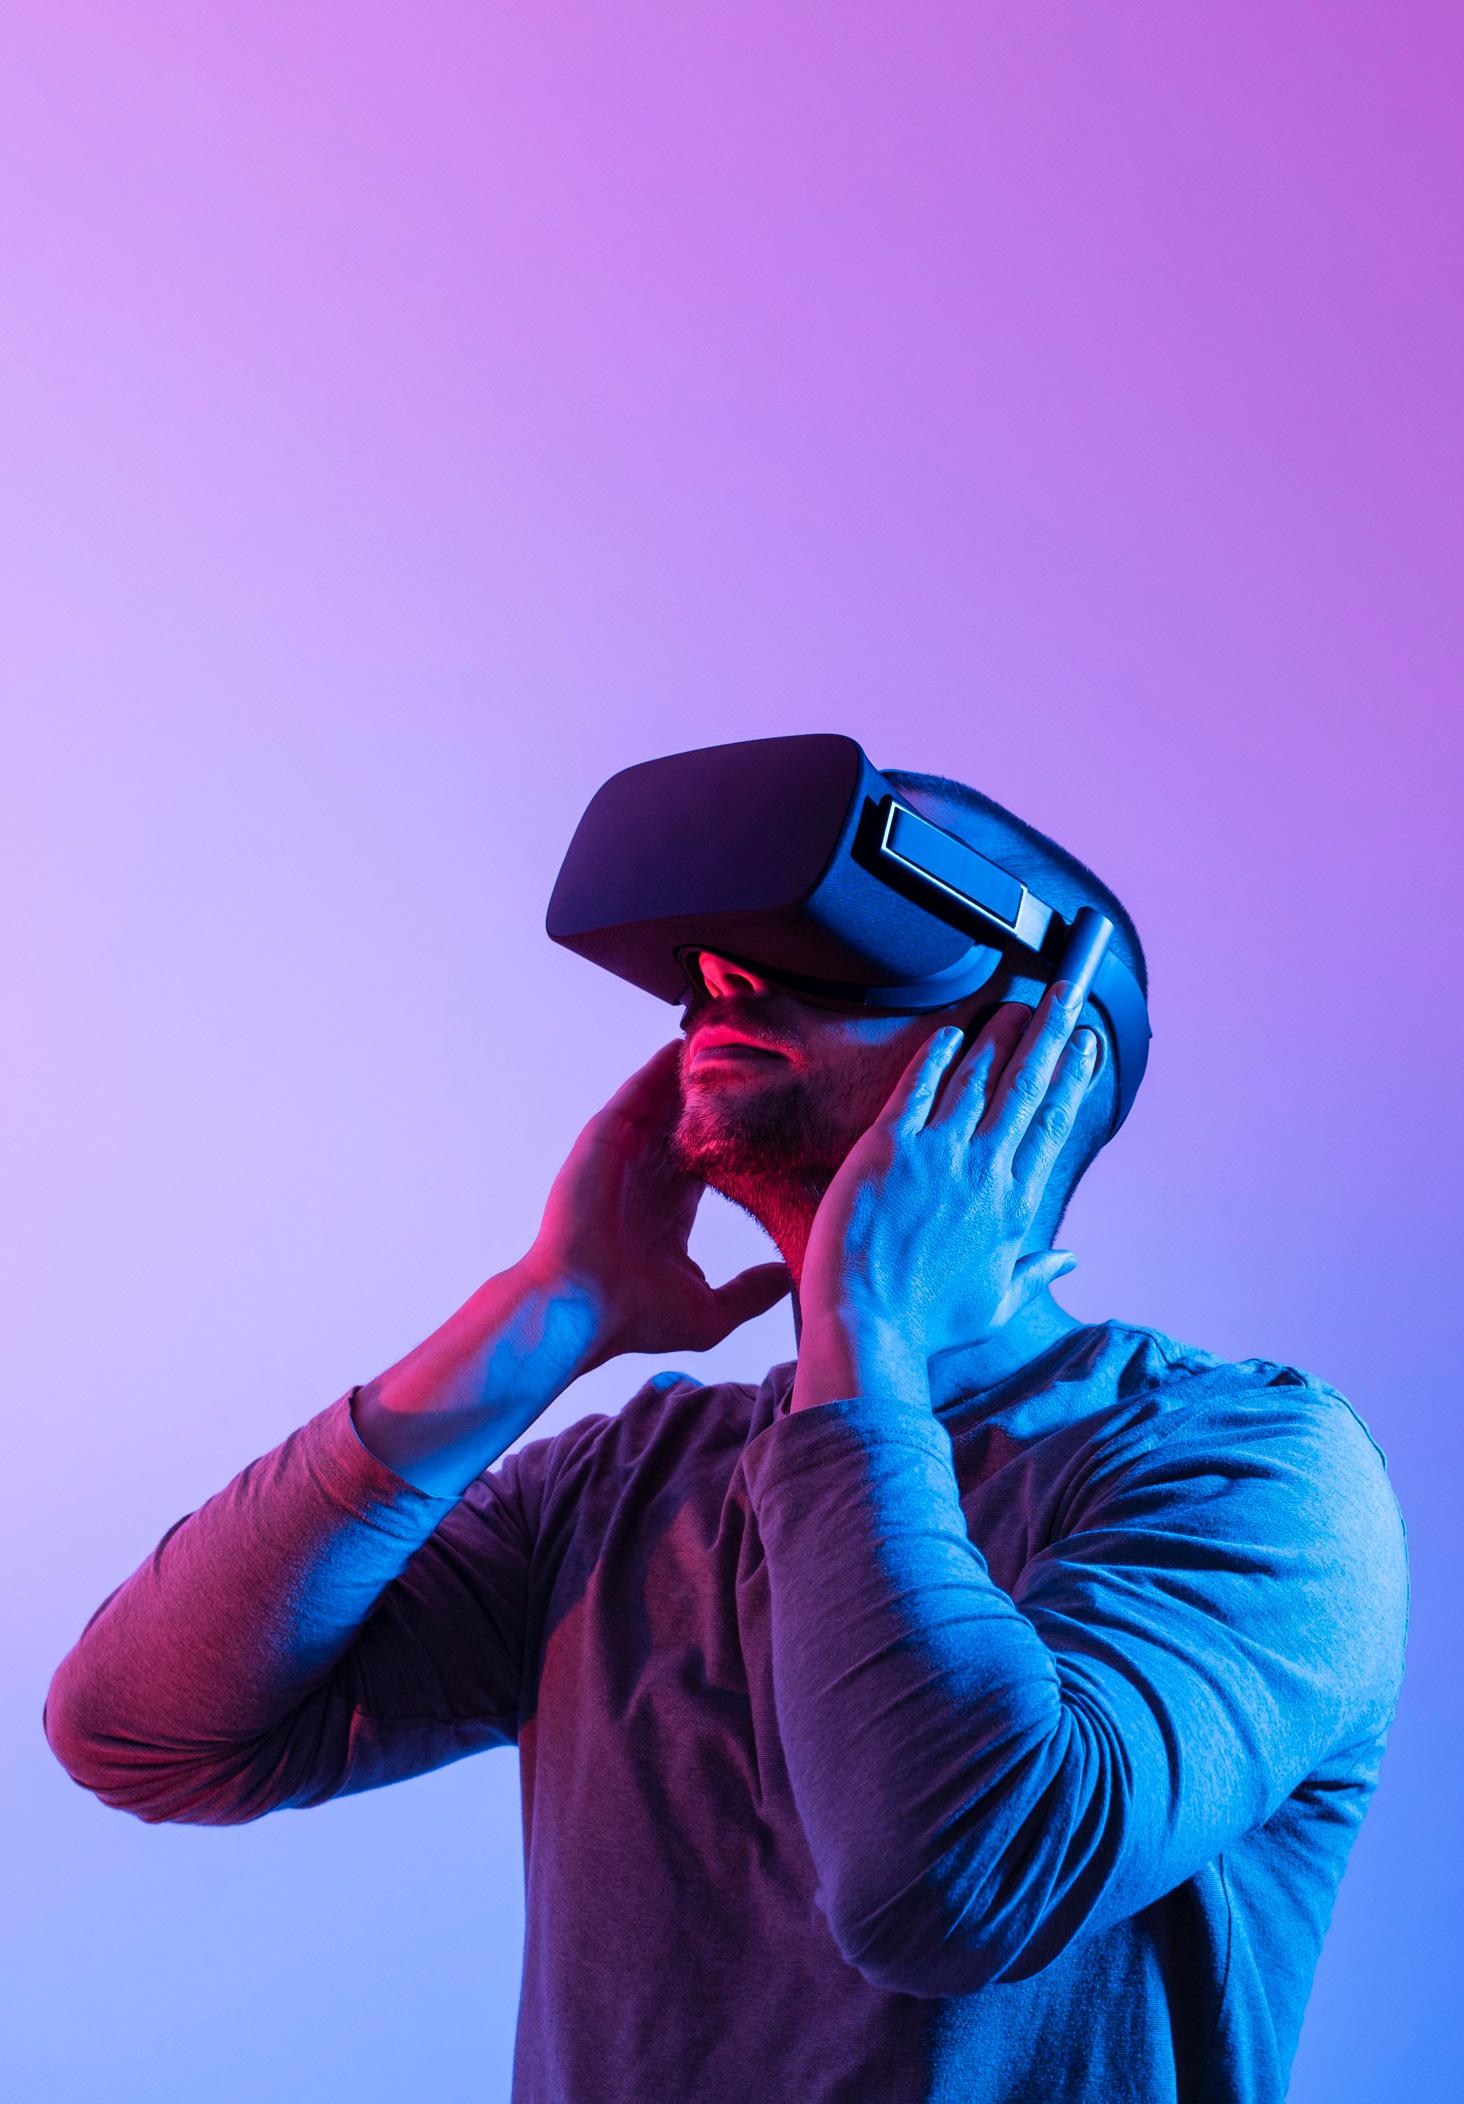 man-with-futuristic-device-medium-shot-1